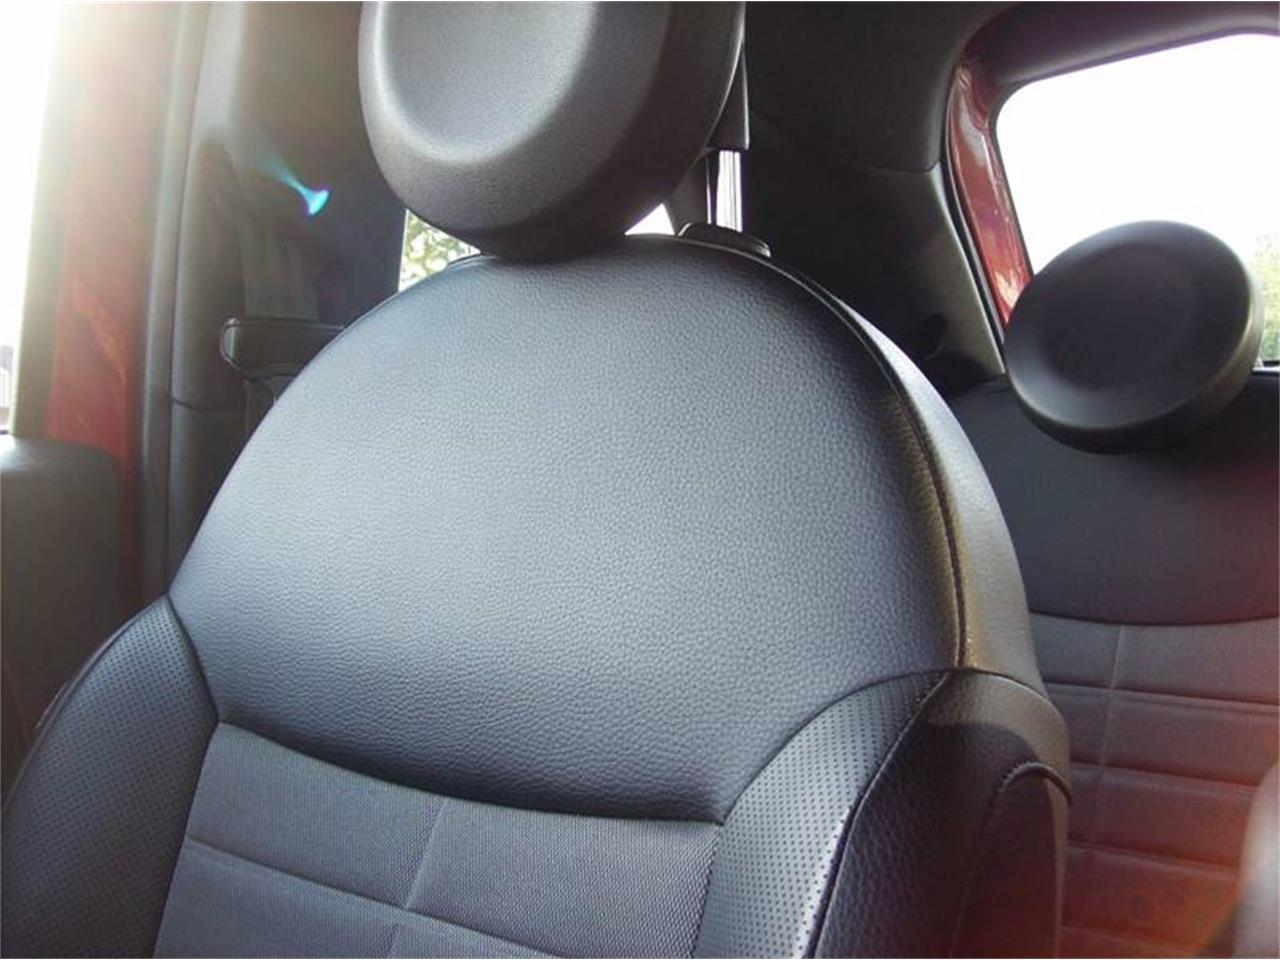 Large Picture of 2013 Fiat 500L located in Michigan - $6,895.00 - LULC